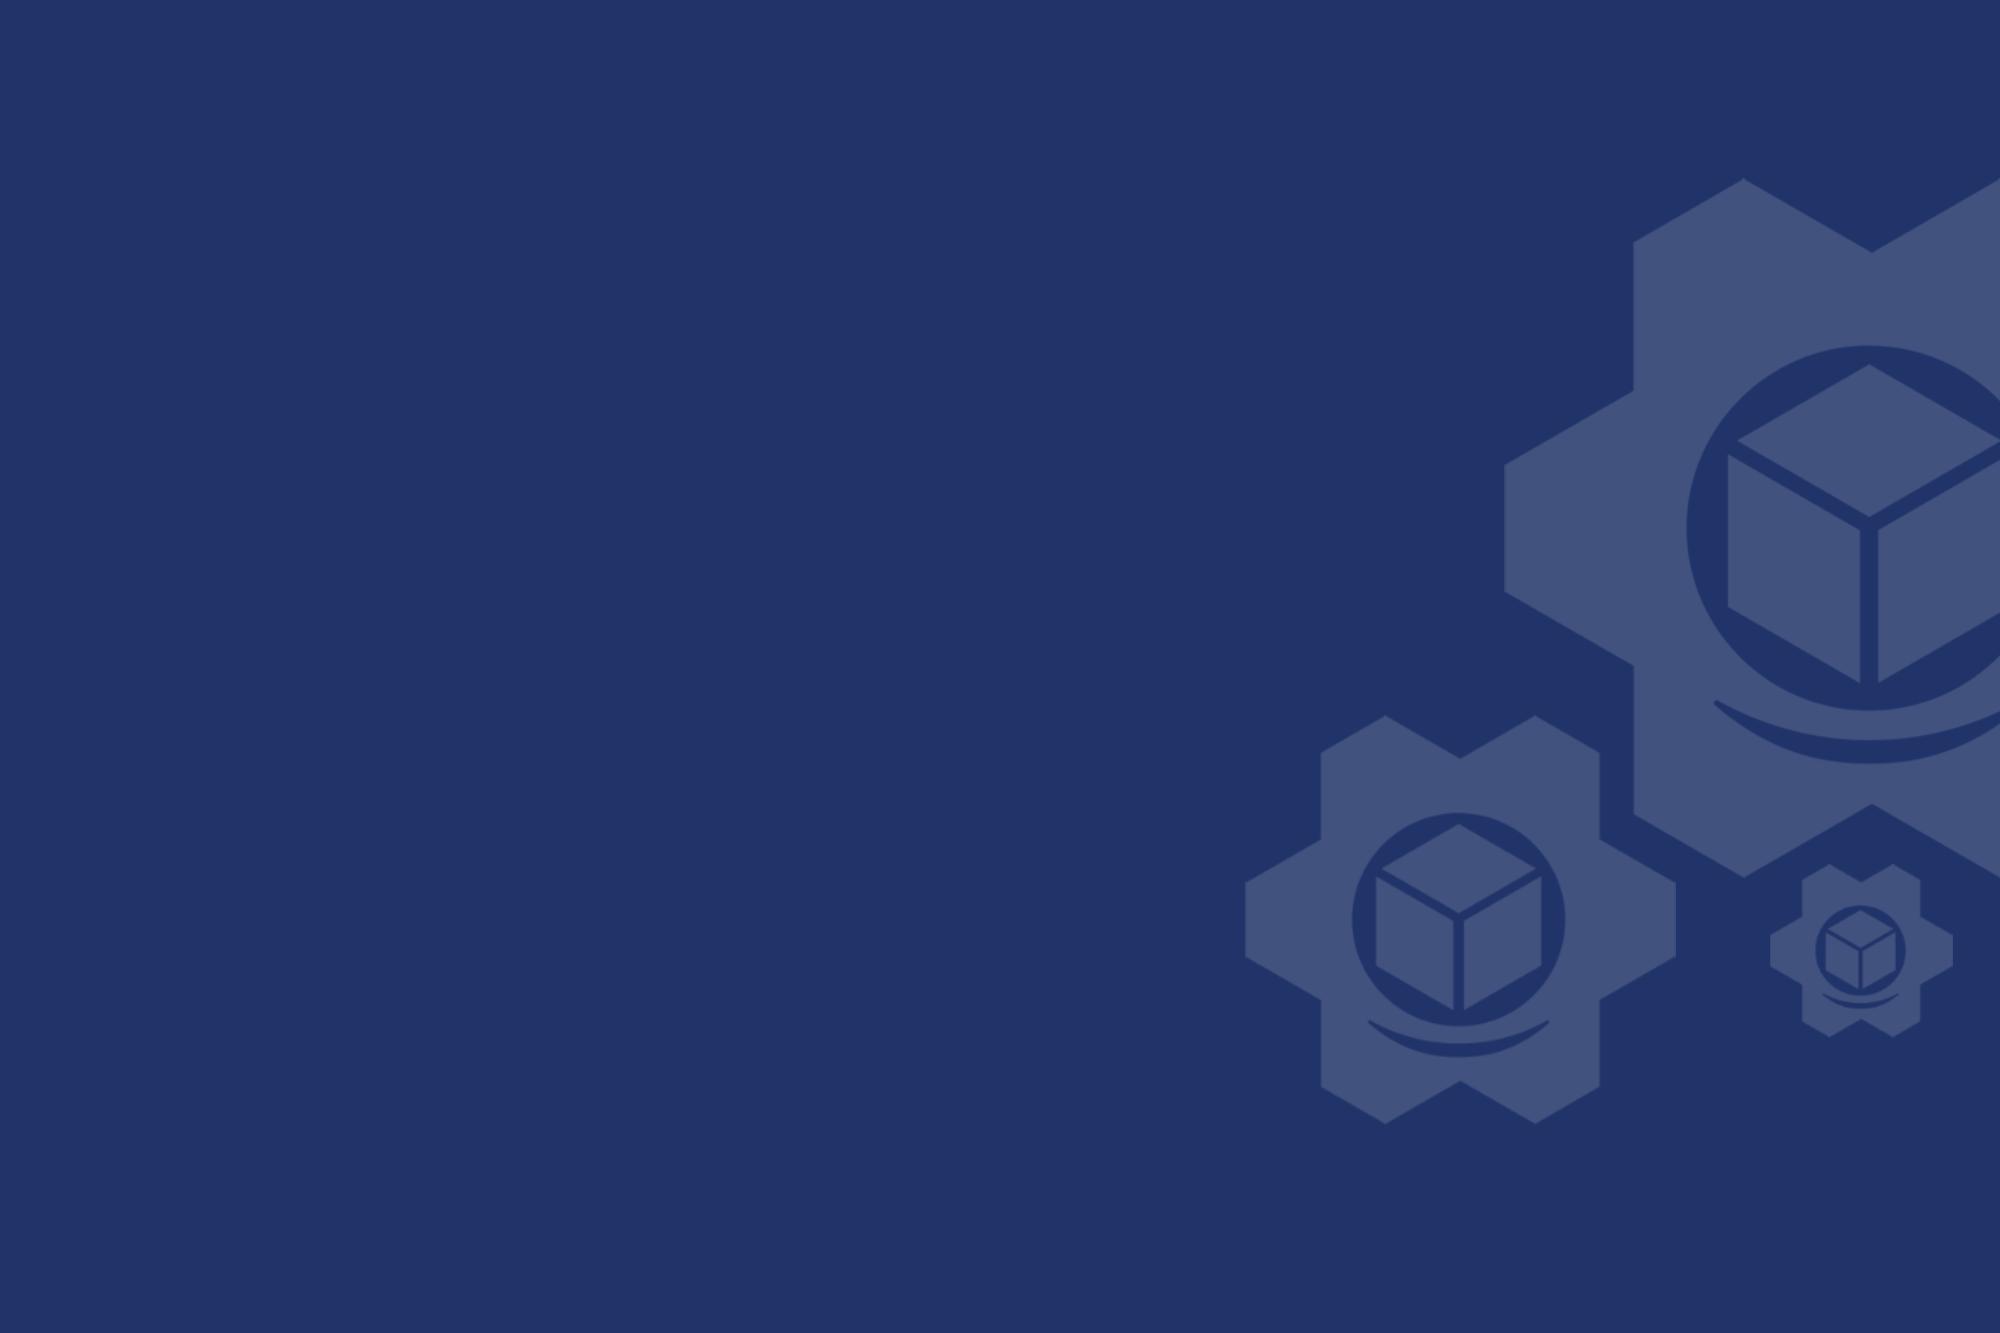 Blue eComEngine gears